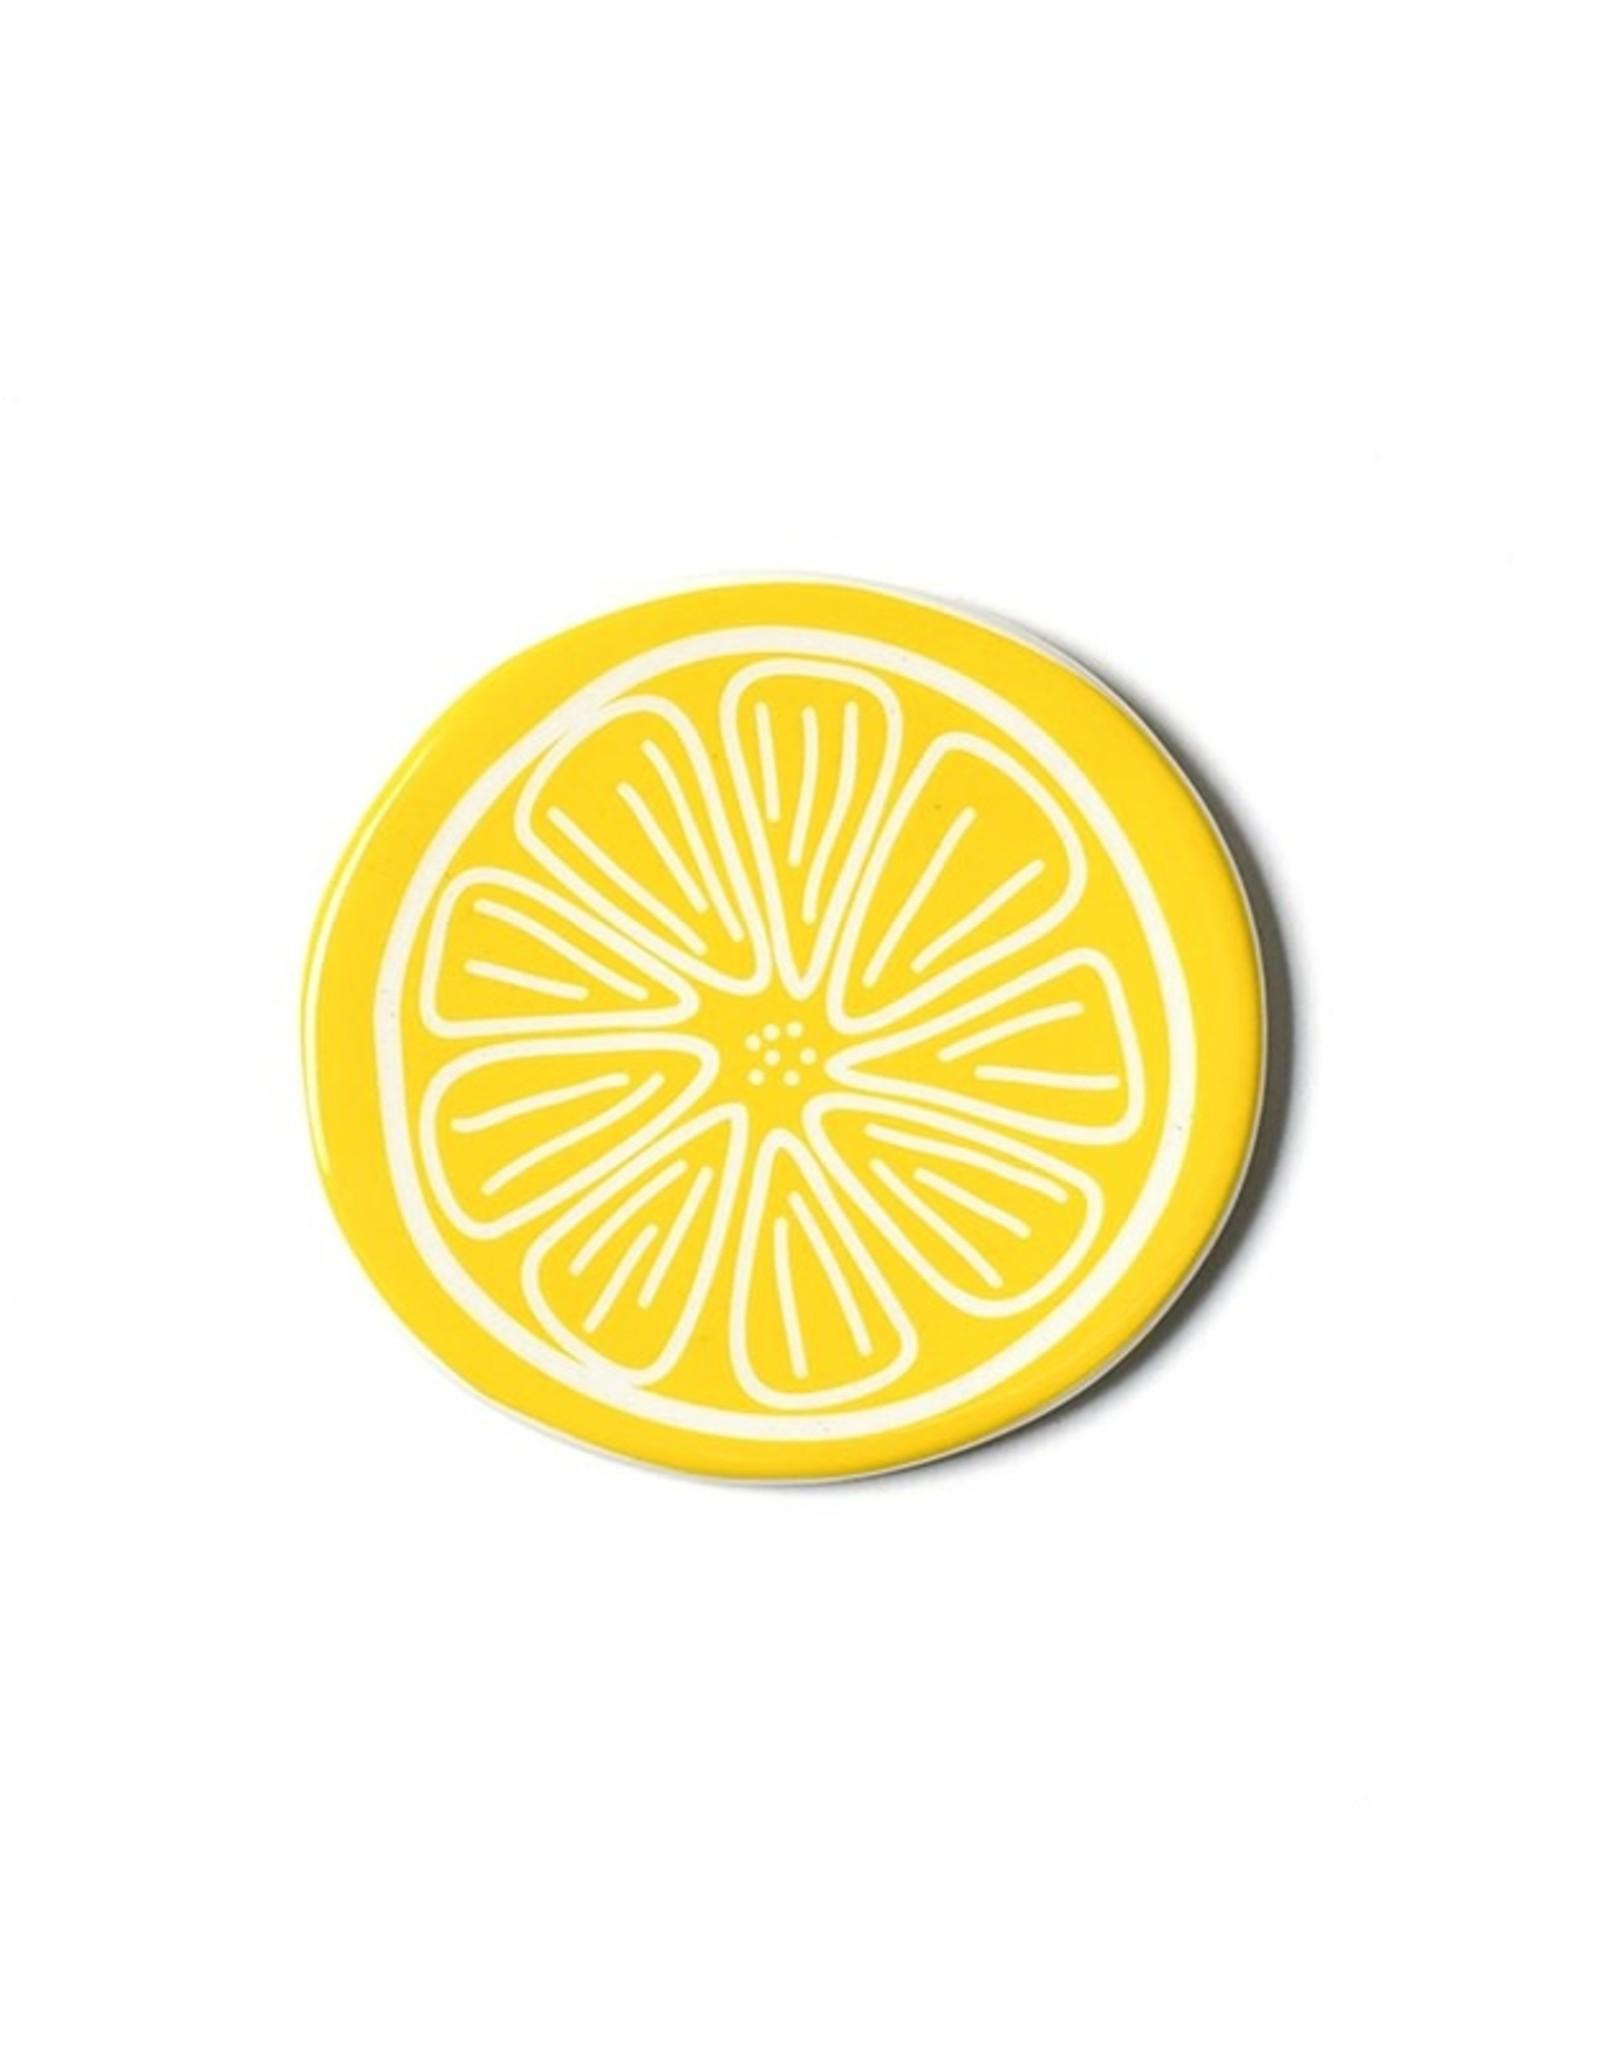 Coton Colors Happy Everything Mini Attachment Lemon Slice